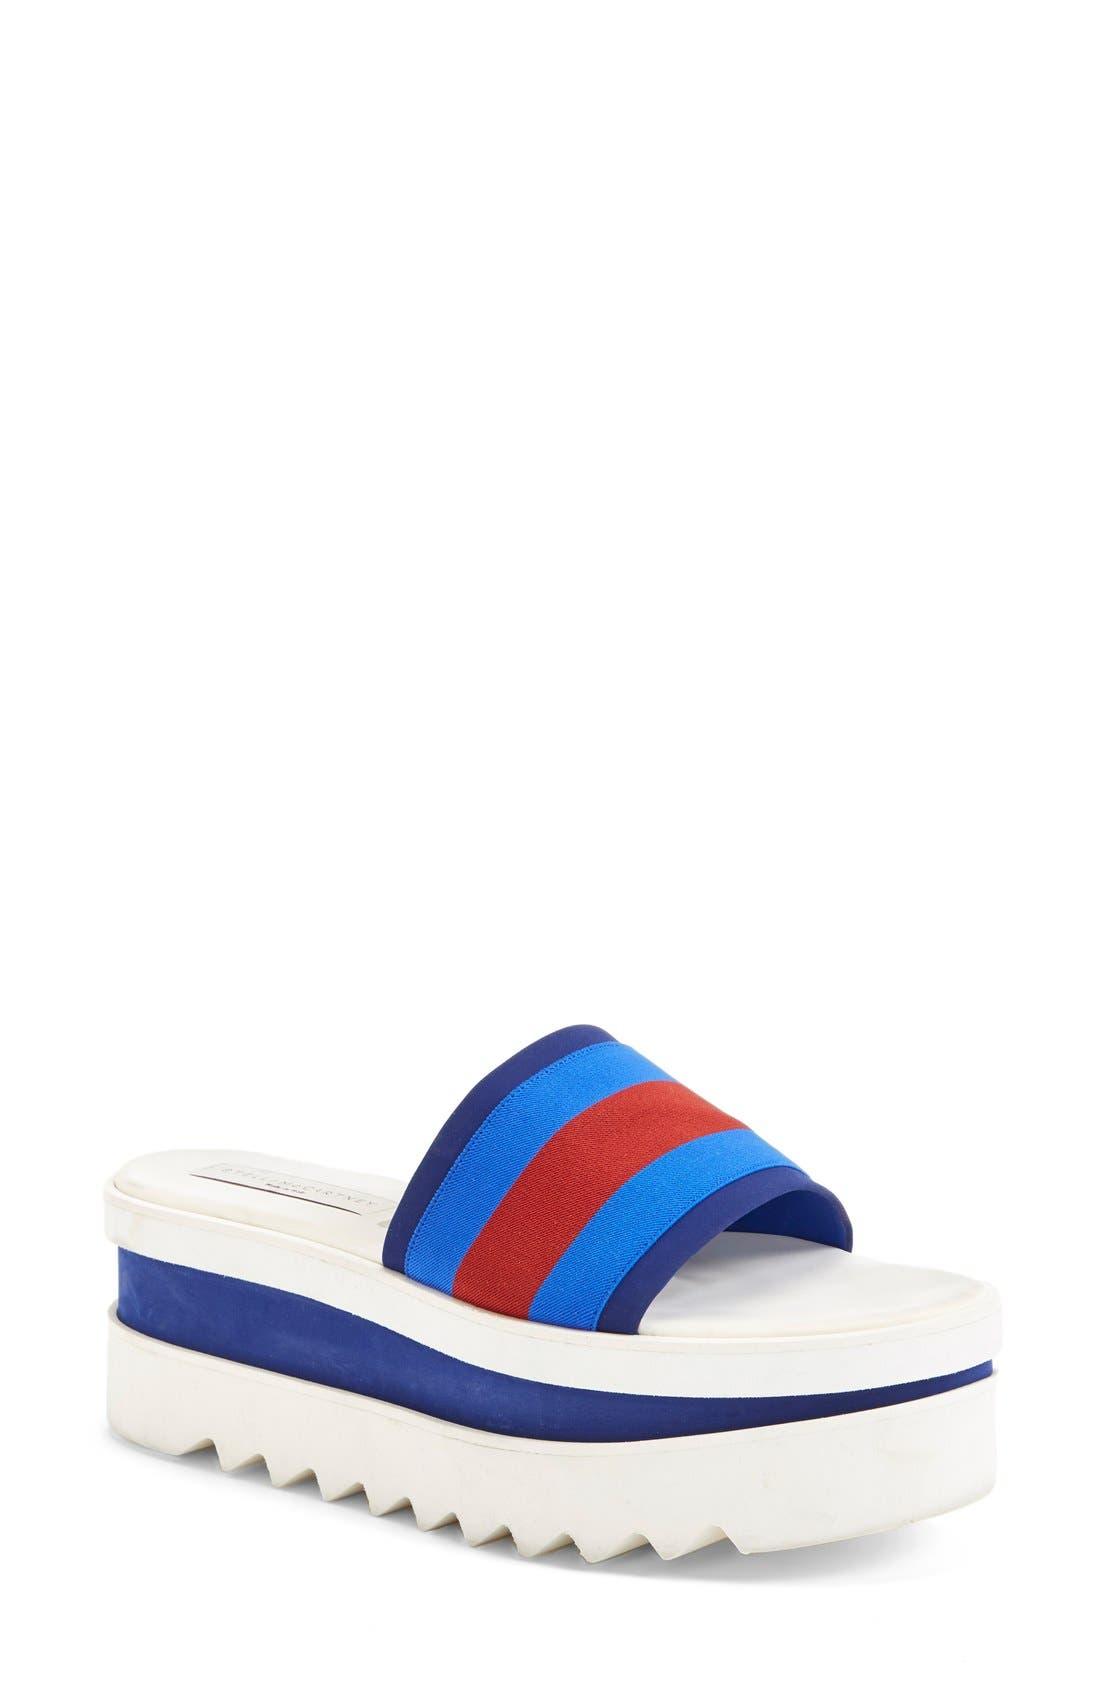 Main Image - Stella McCartney Platform Slide Sandal (Women)